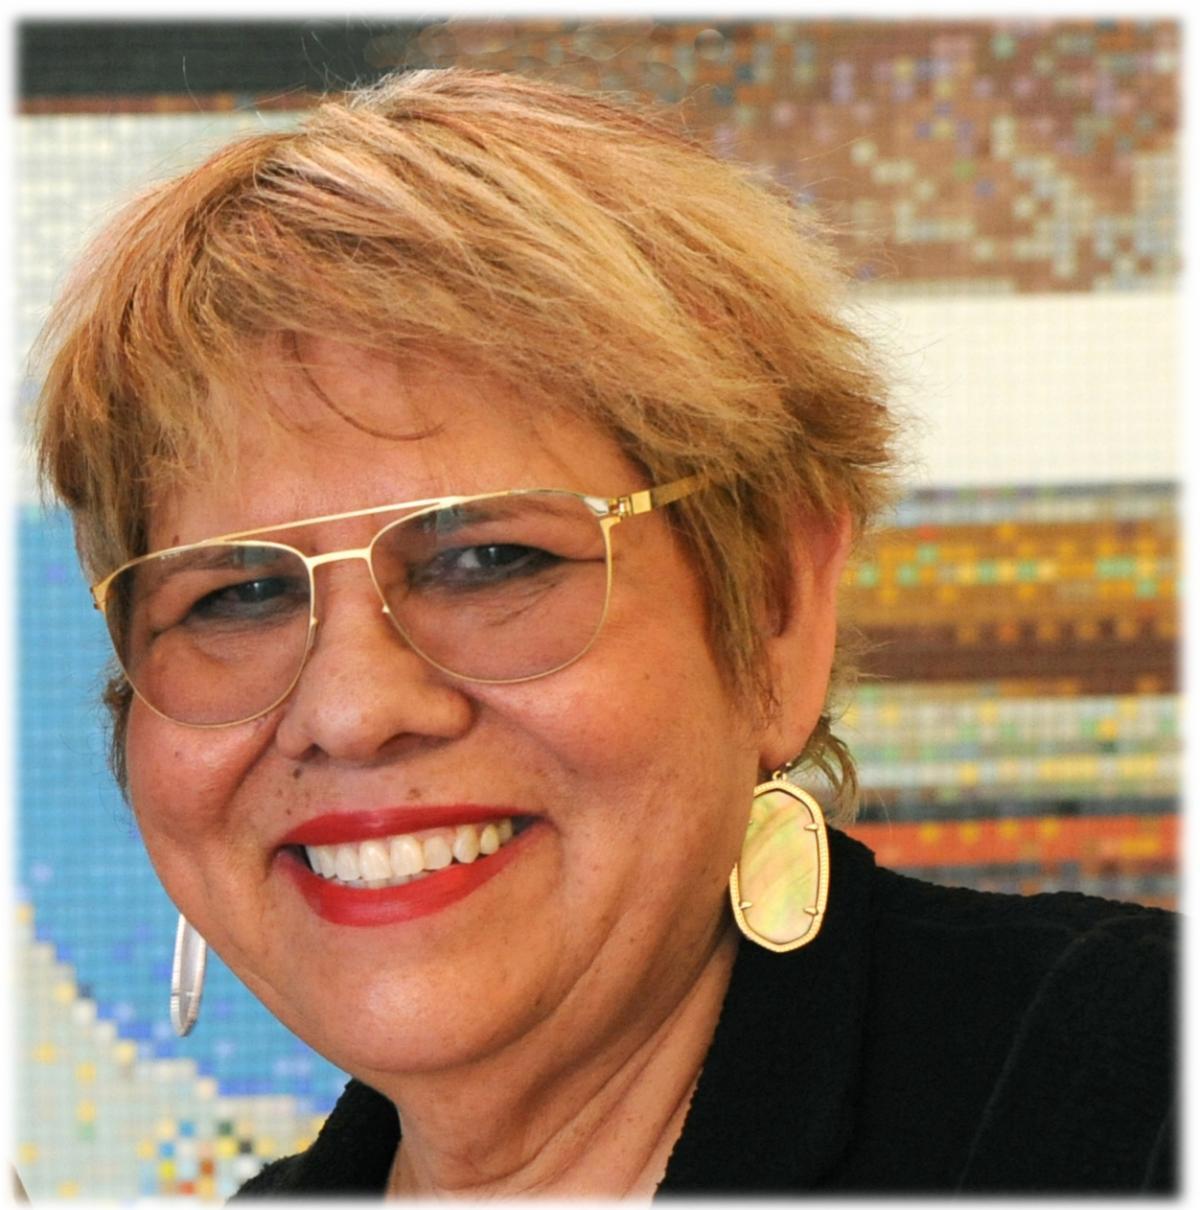 Laura Rendon